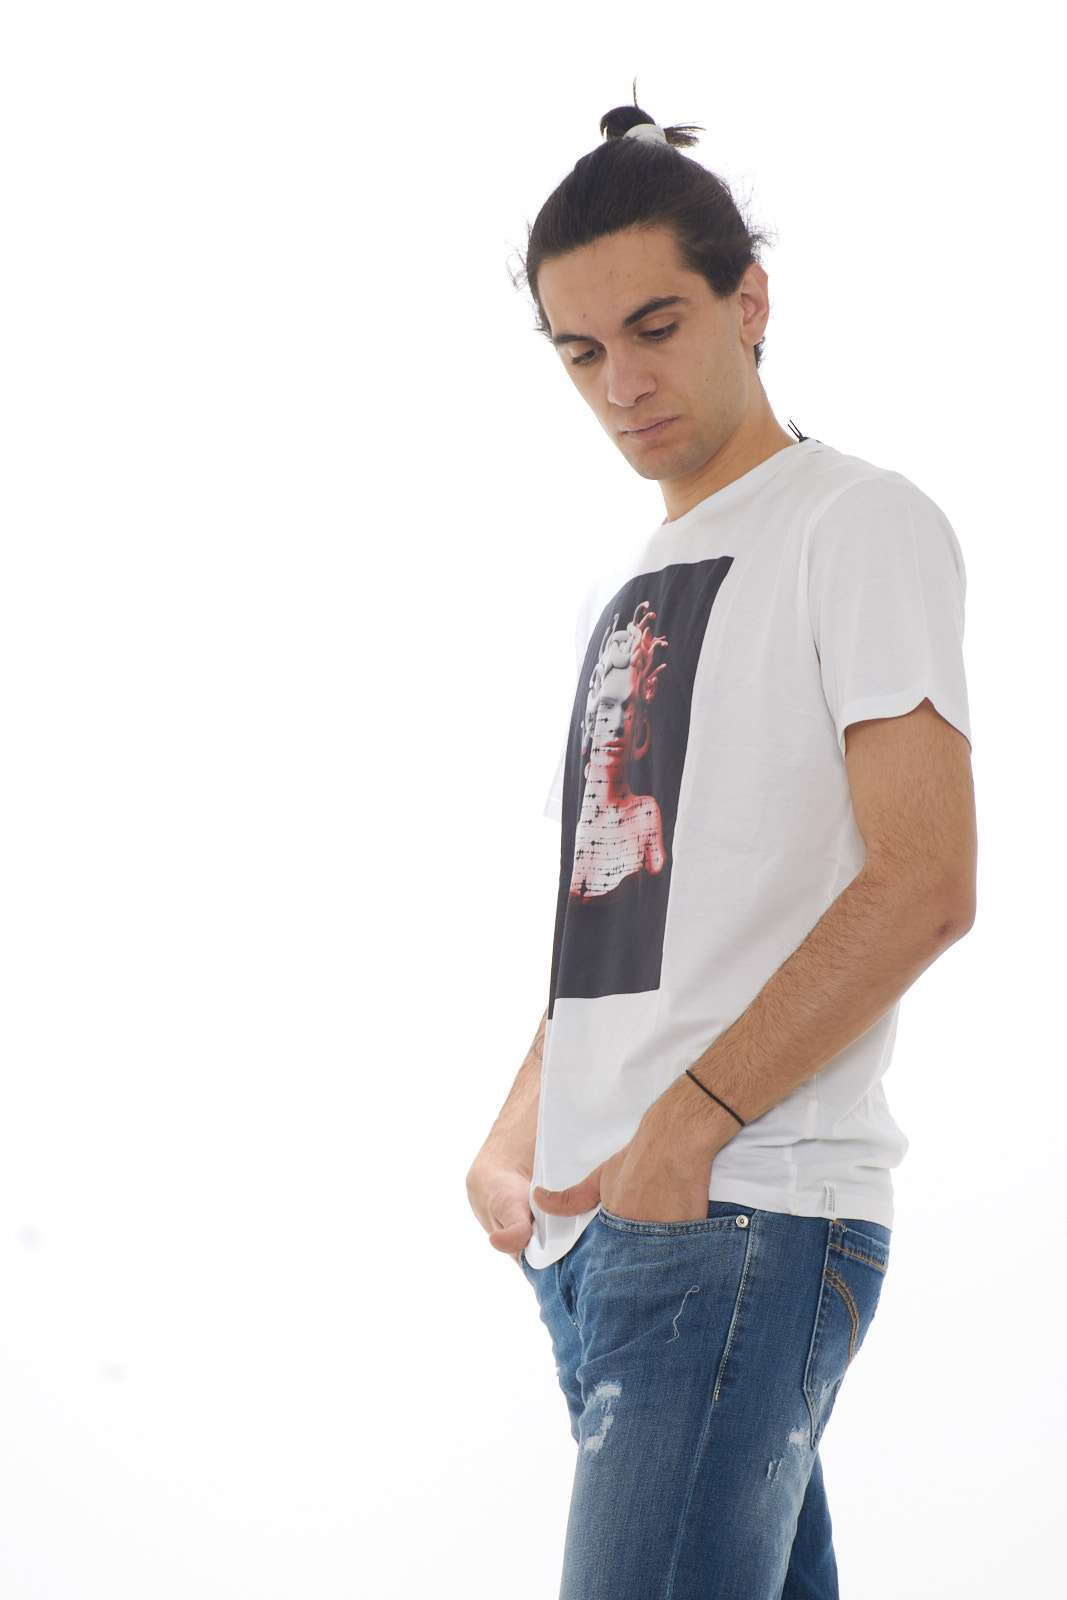 https://www.parmax.com/media/catalog/product/a/i/PE_outlet_parmax-t-shirt-uomo-Bomboogie-TM5602-B.jpg